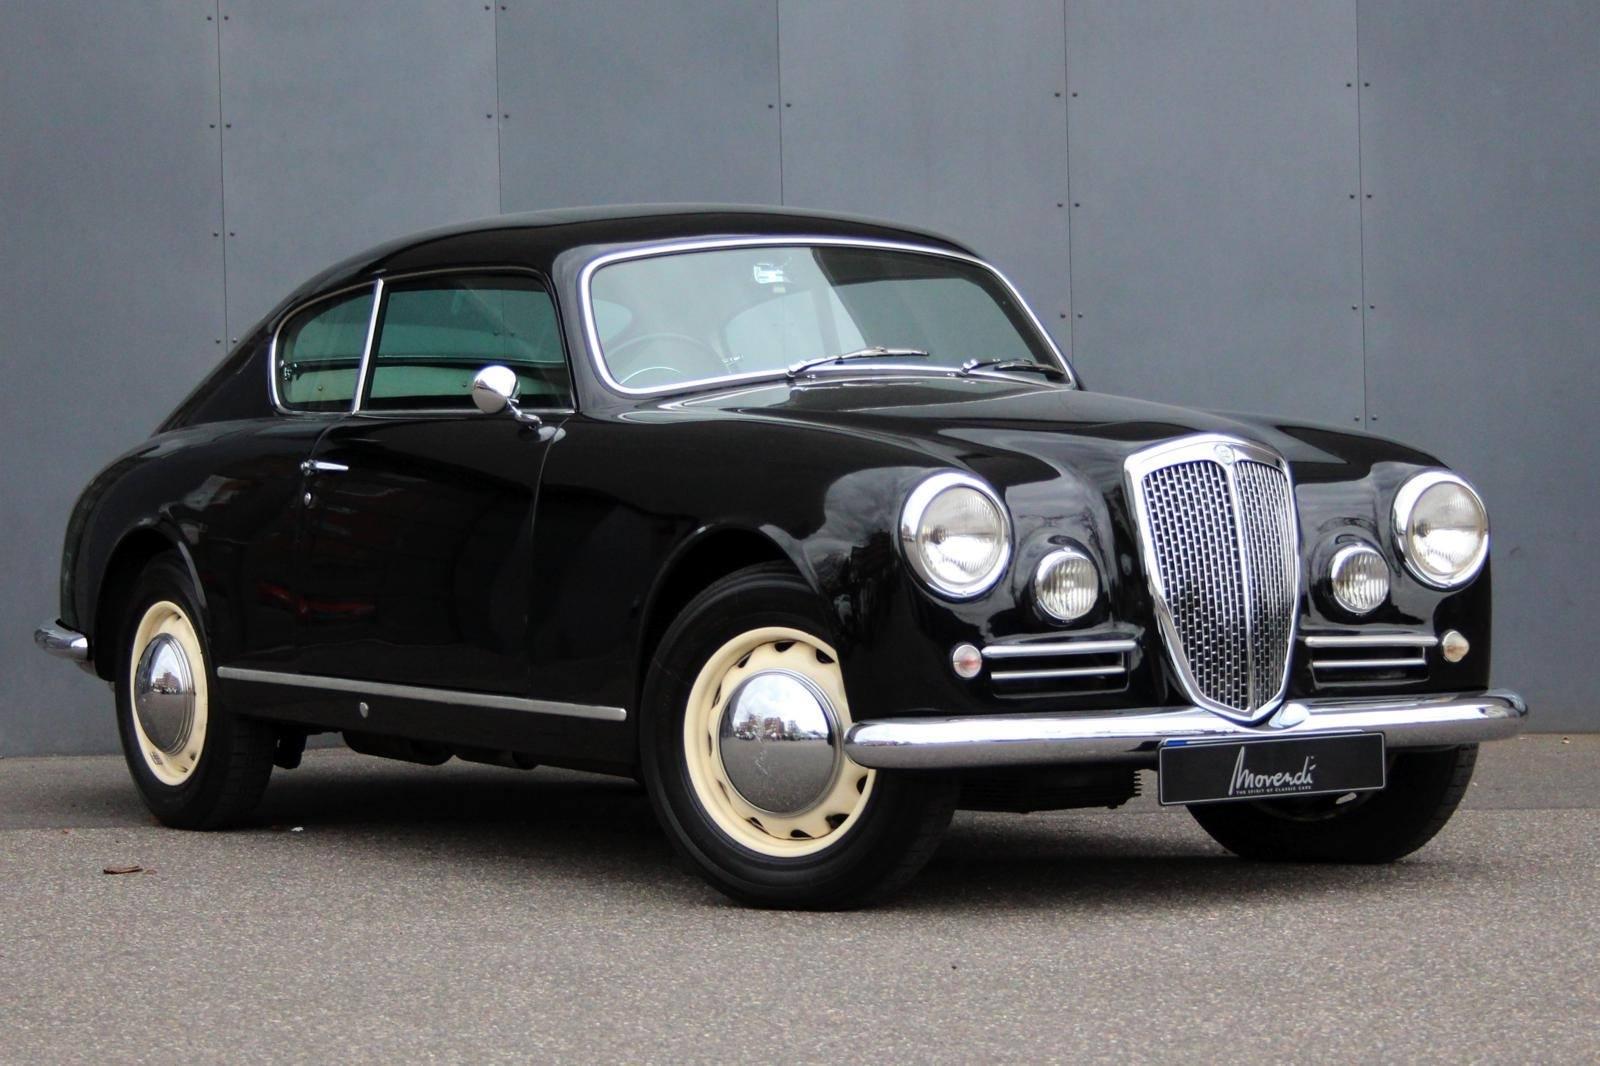 Lancia-Aurelia-B20-GT-Coupe-1954-1